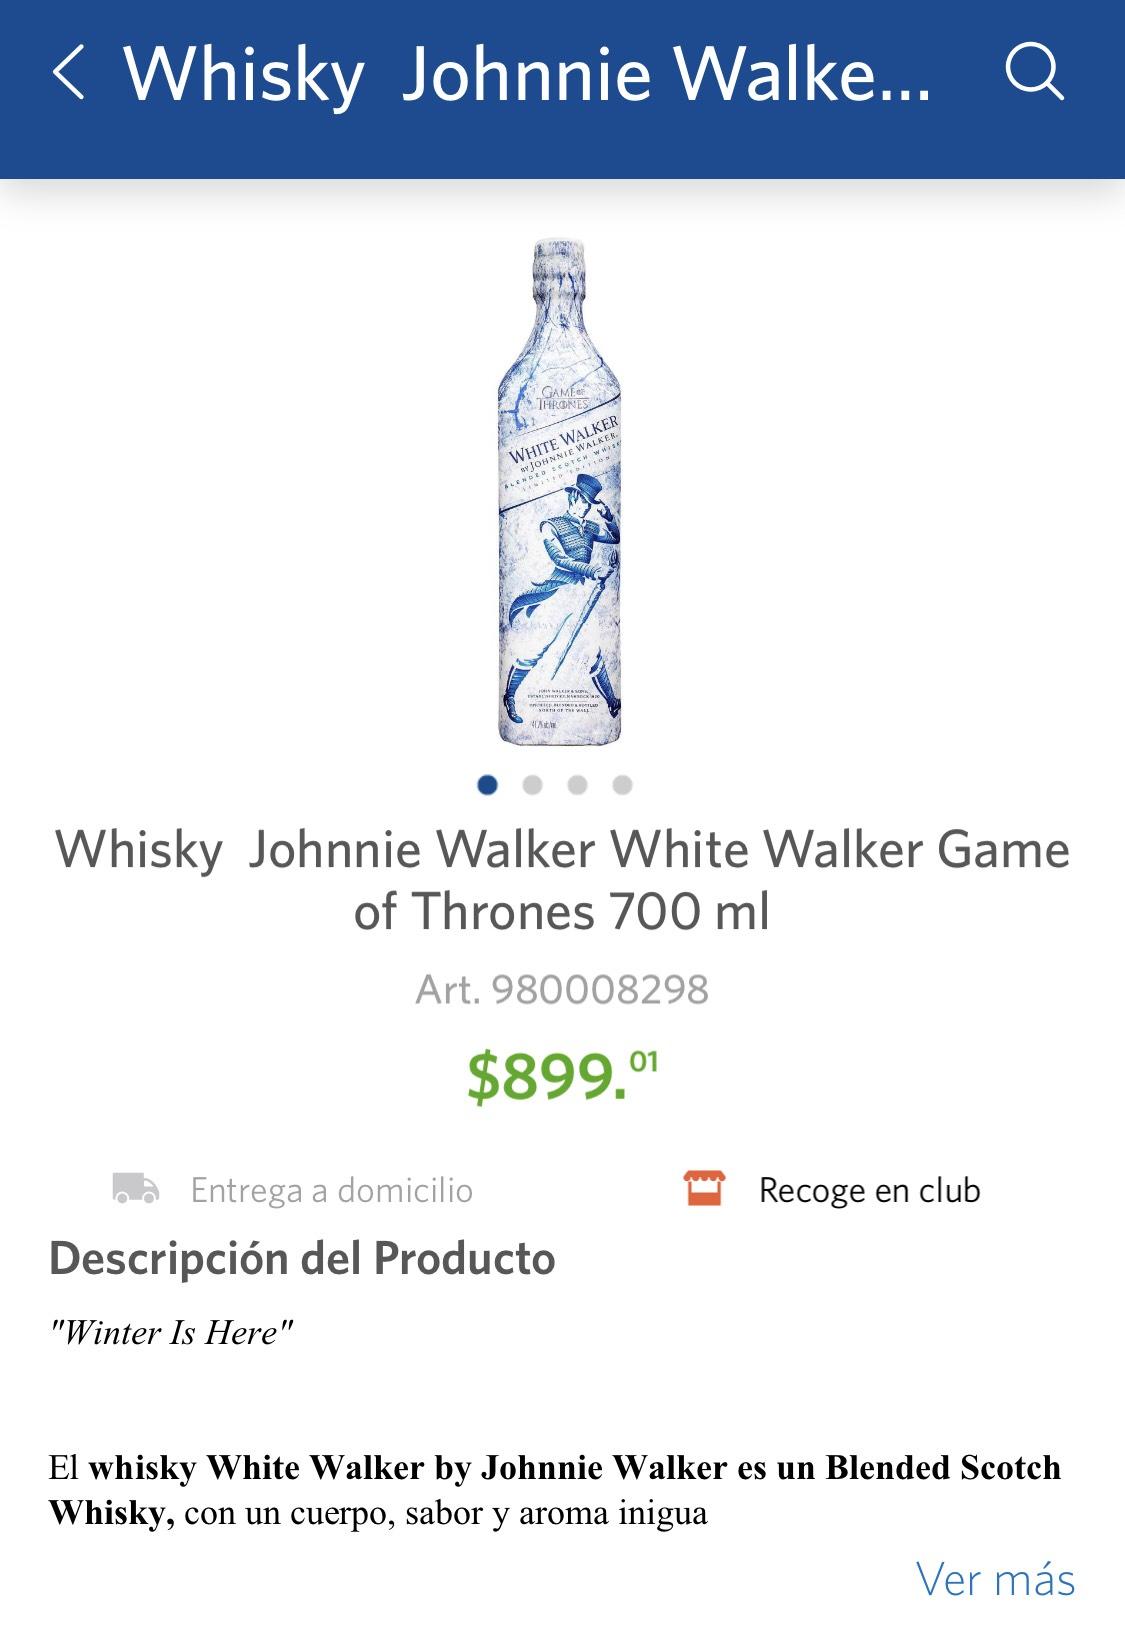 Sam's Club: Whisky Johnnie Walker White Walker Game of Thrones 700 ml